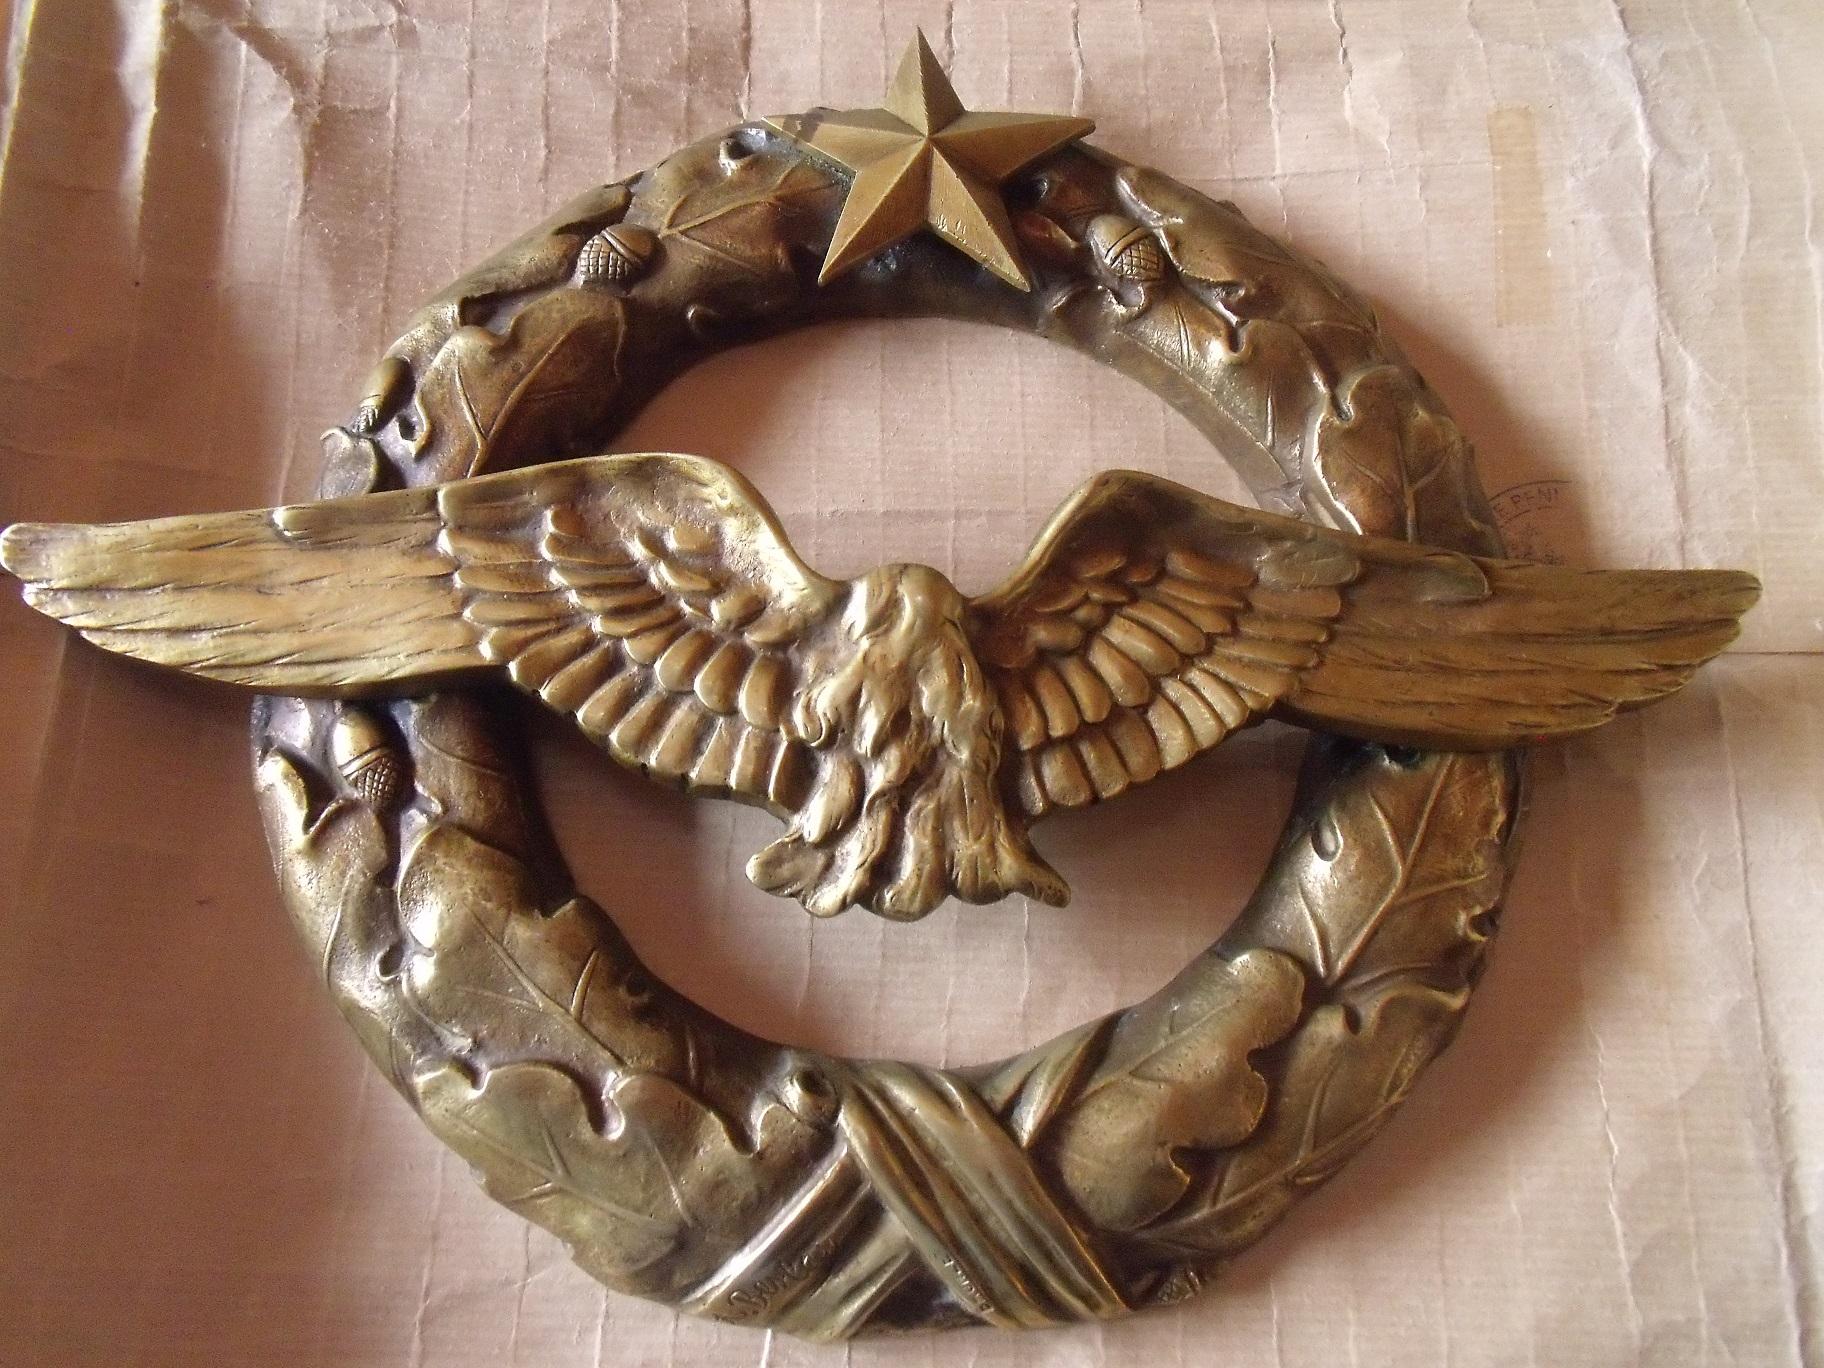 Trouvaille : brevet macaron aviation en bronze I77ri9